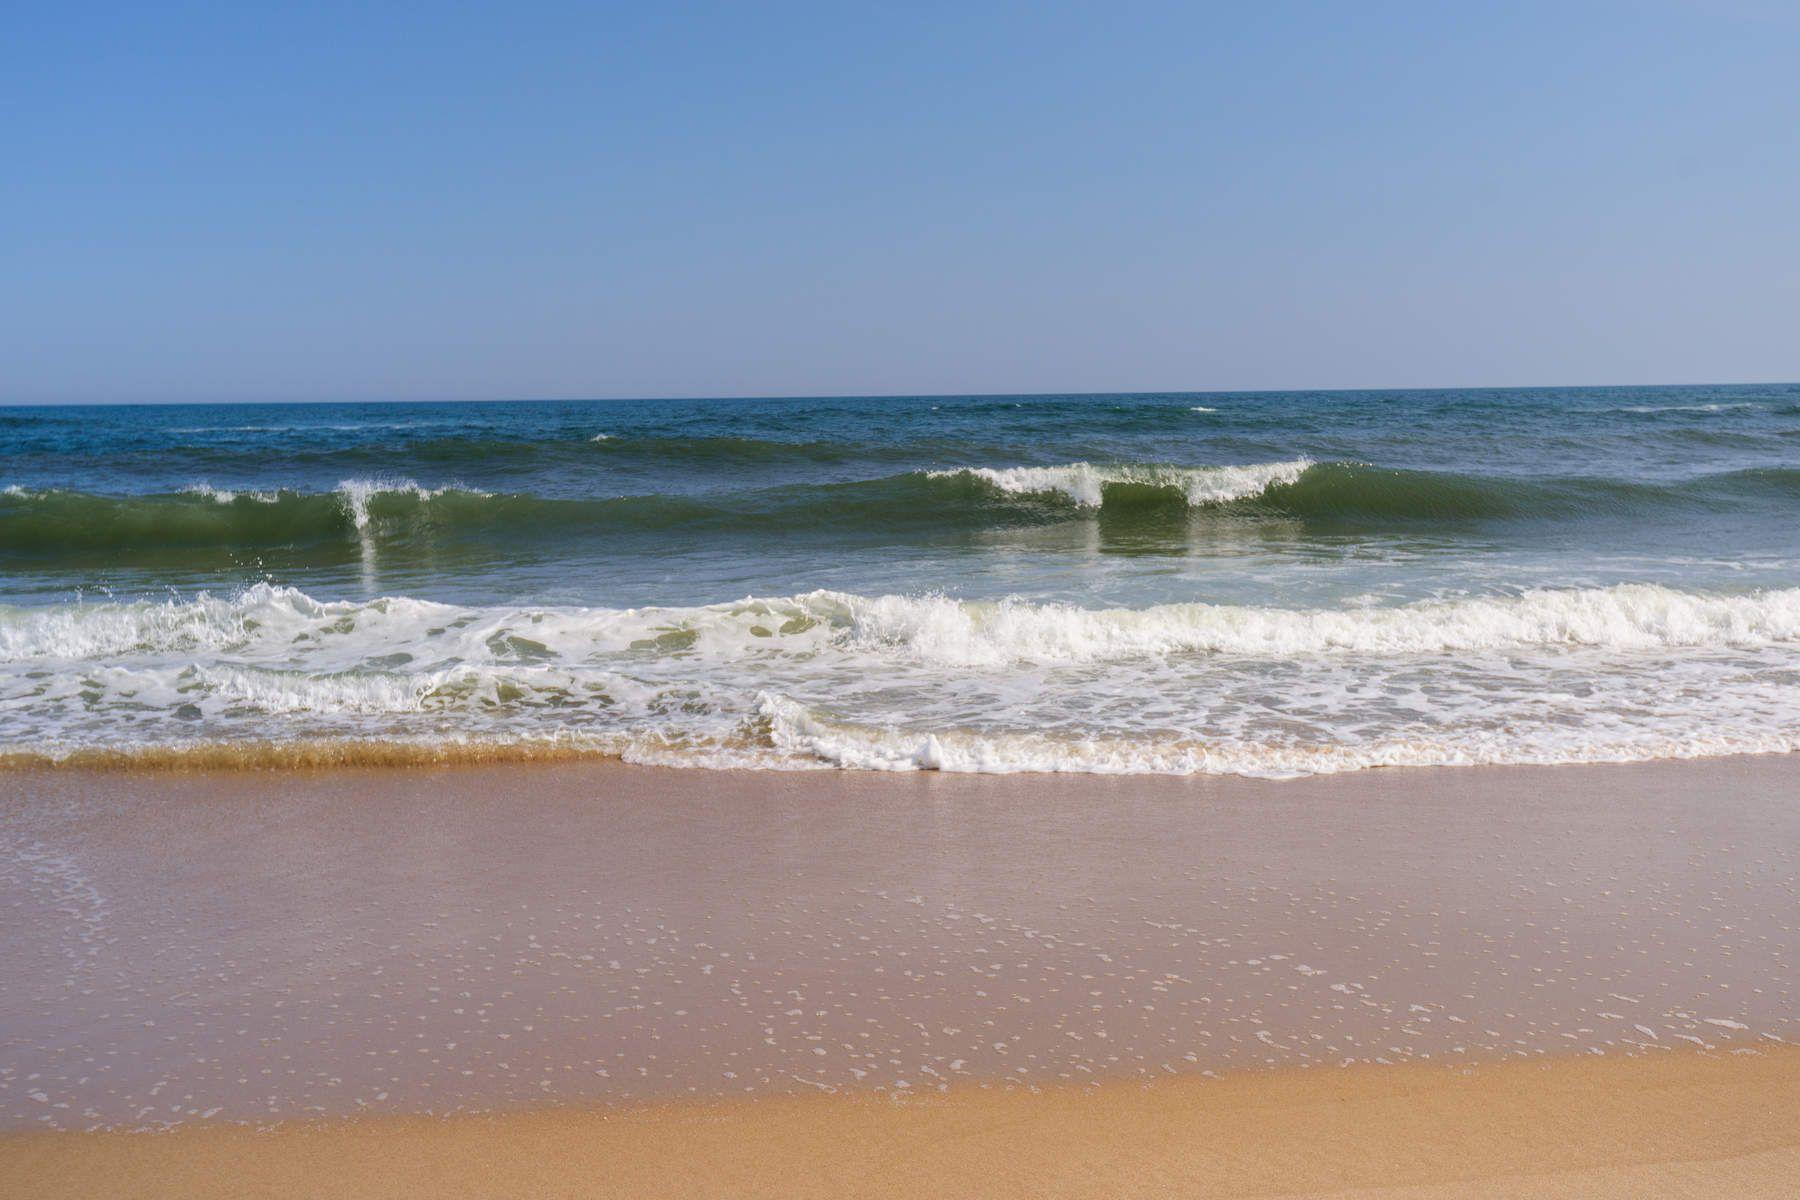 Земля для того Продажа на Expansive Ocean Views 36 Whalers Lane, Amagansett, Нью-Йорк, 11930 Соединенные Штаты